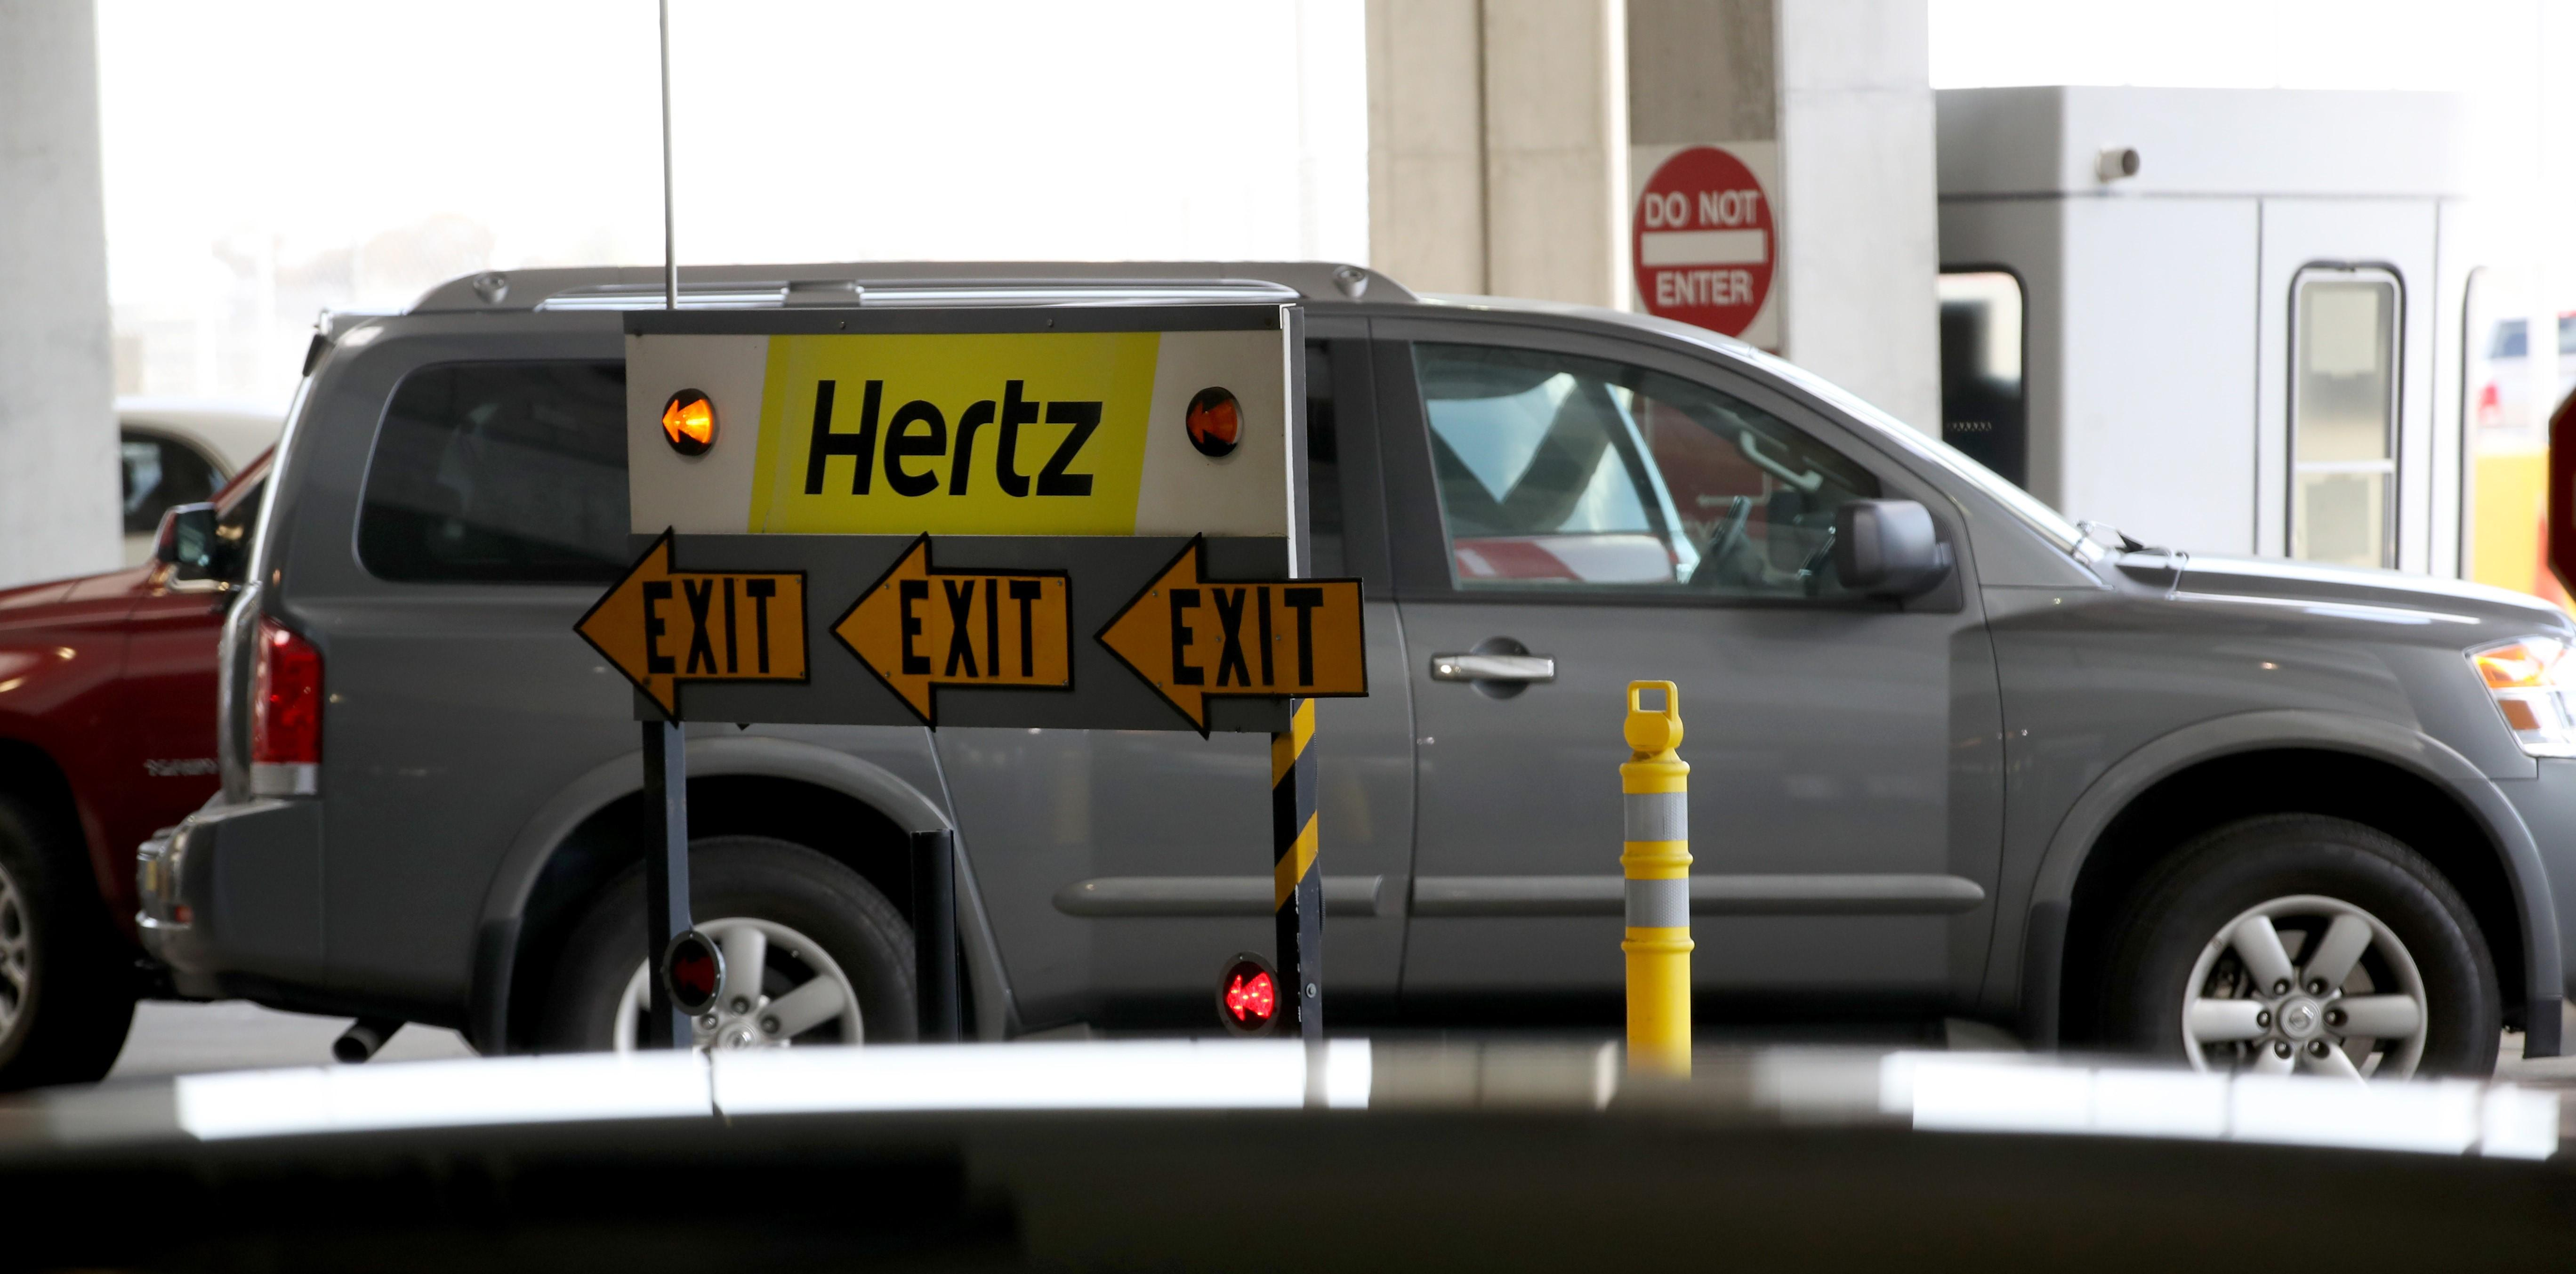 Hertz exit sign